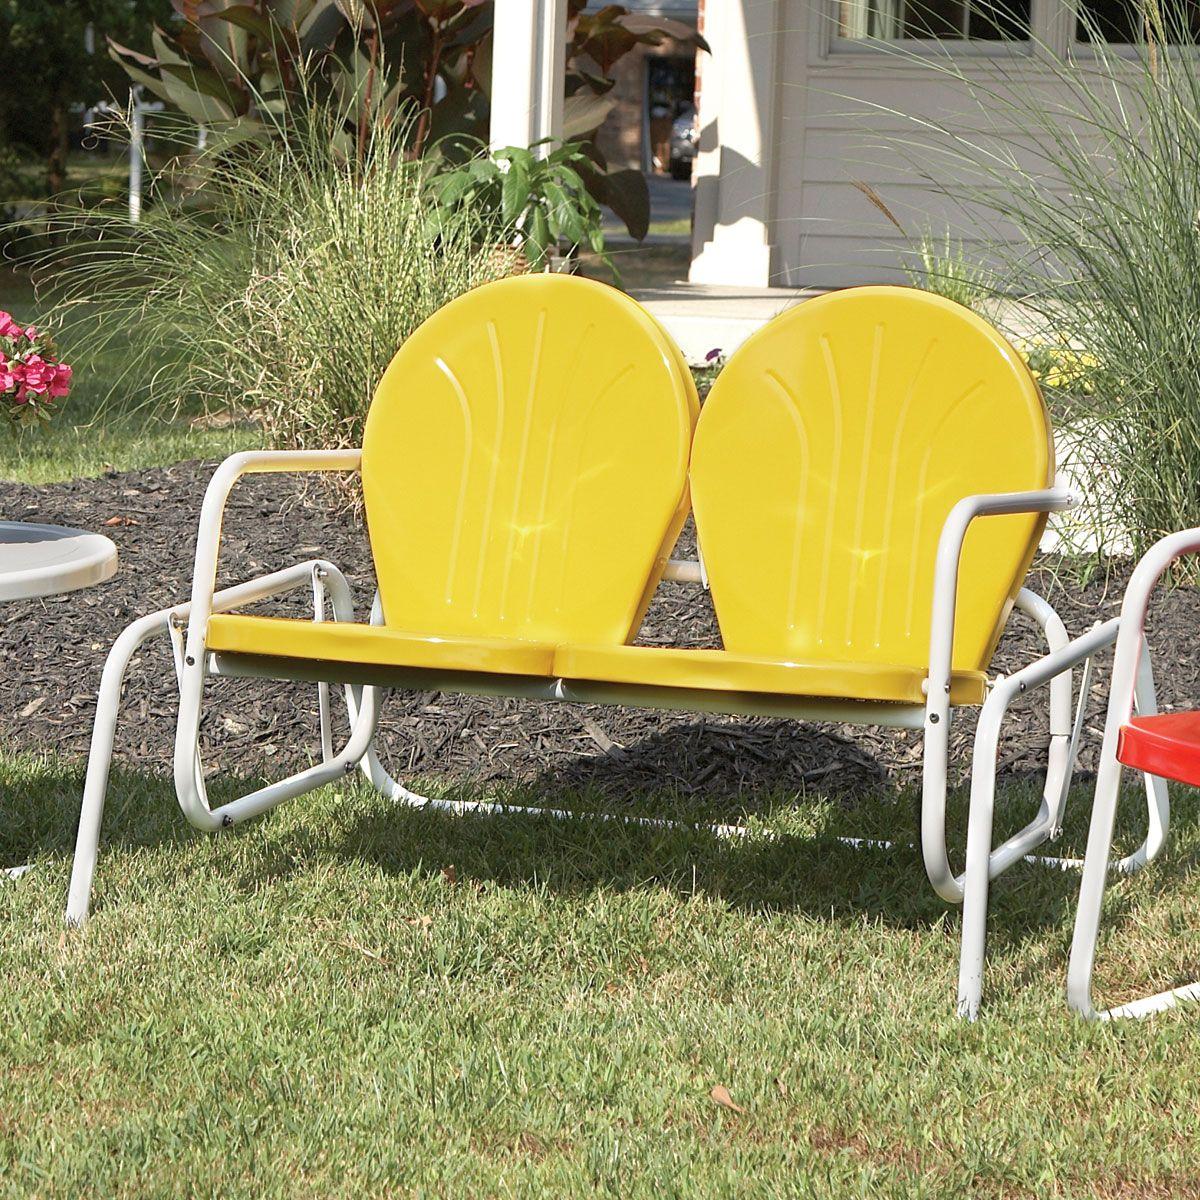 Vintage Metal Chairs Outdoor Retro Glider Lawn